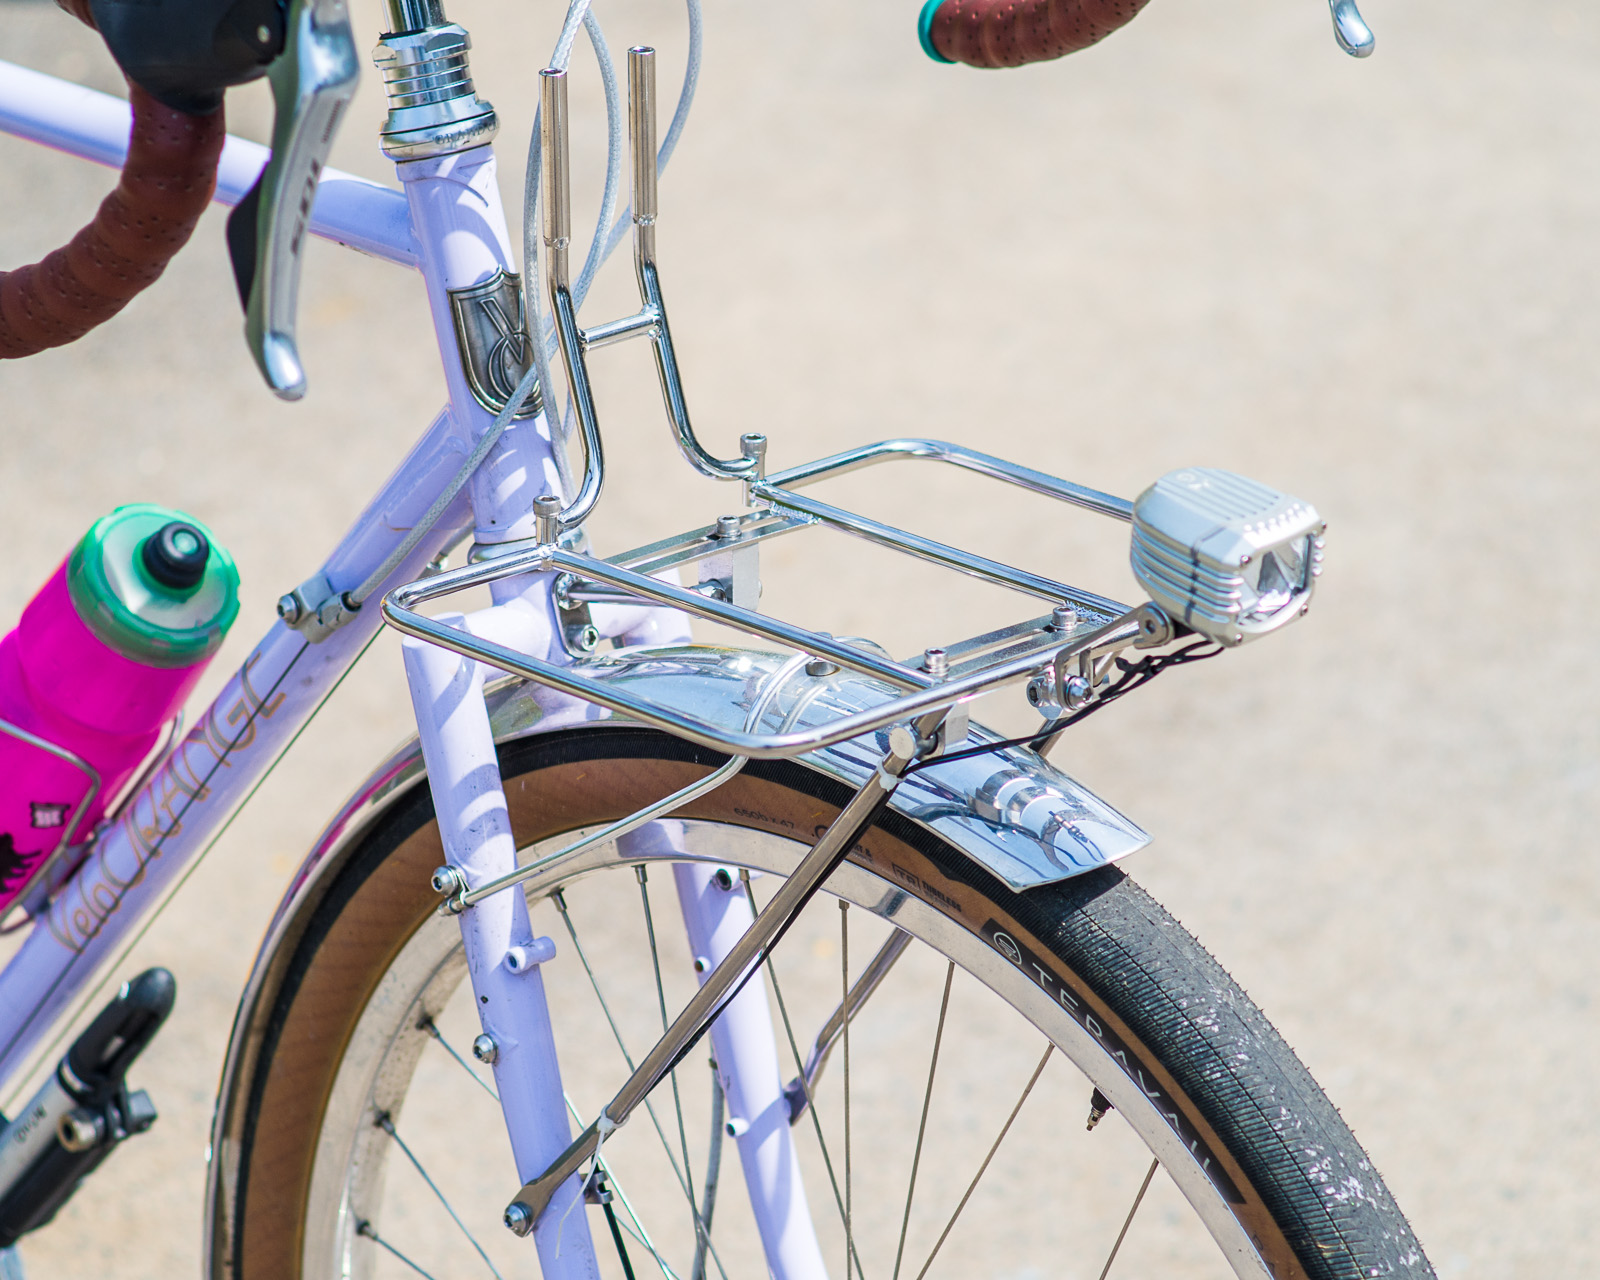 Velo Orange Randonneur Front Rack for bikes with Cantilever Brakes